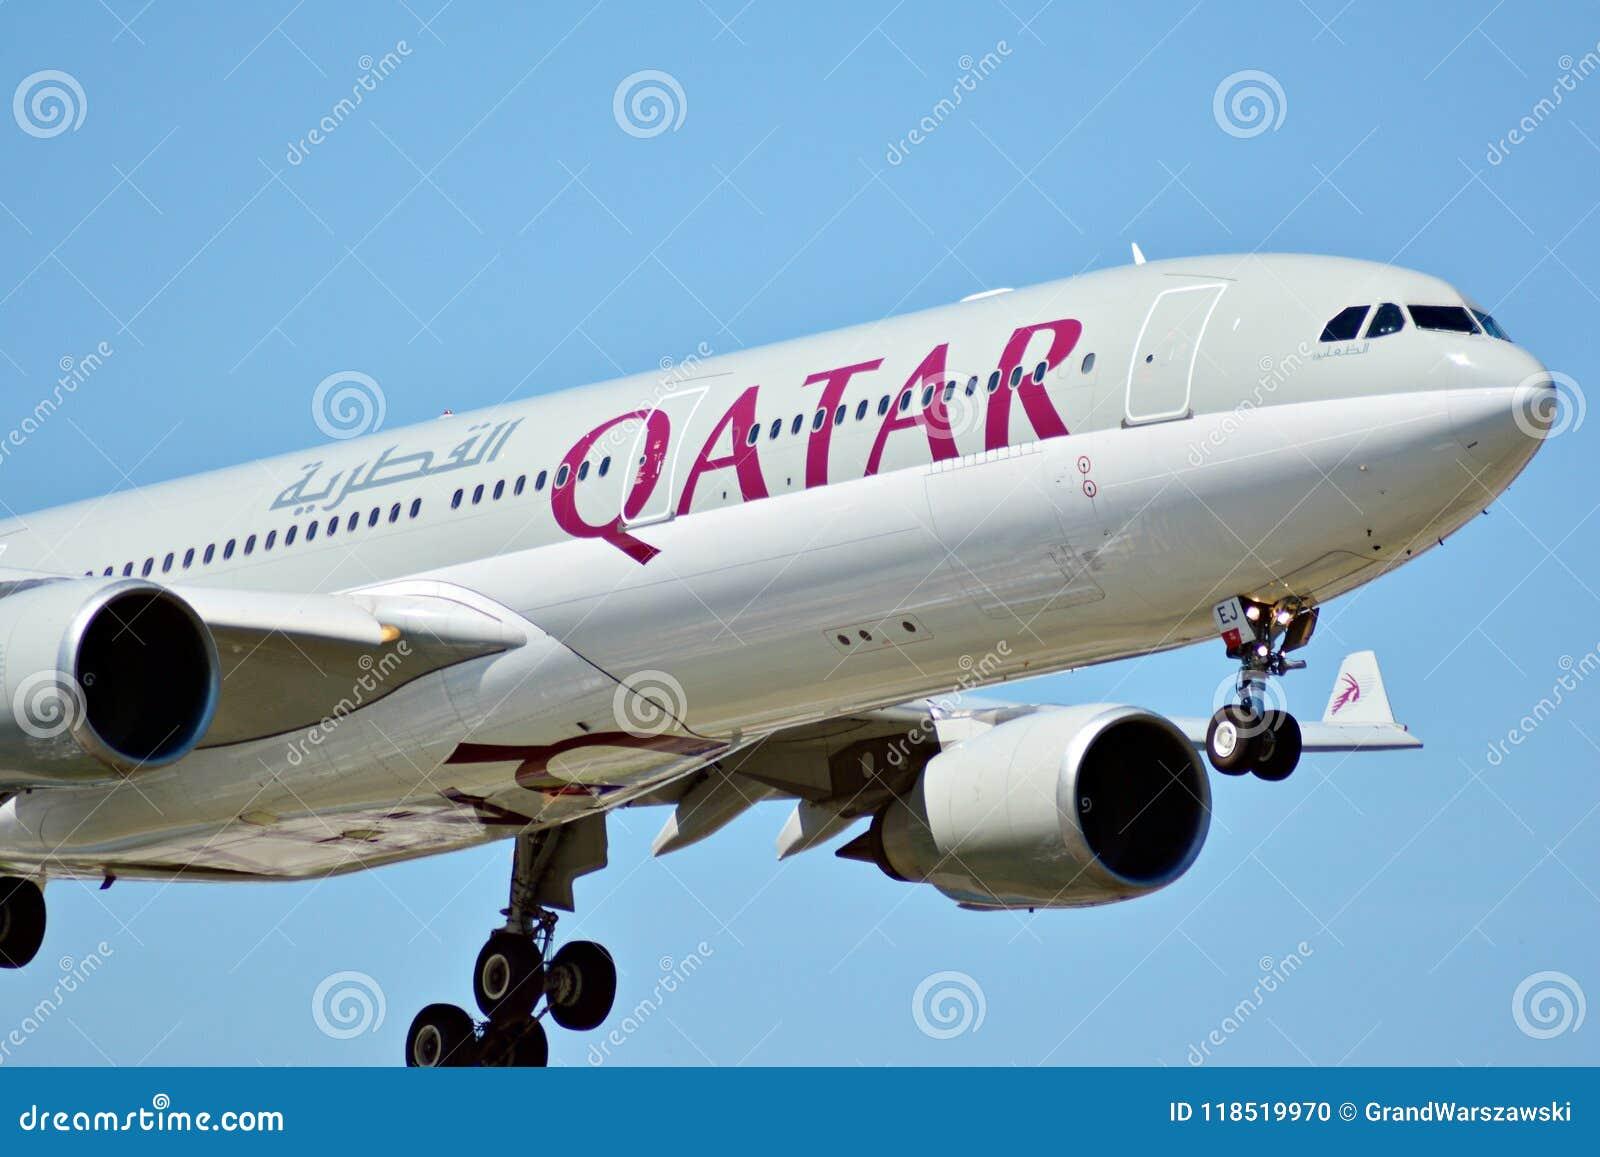 Plane A7-AEJ Qatar Airways Airbus A330-302 just before landing at the Chopin airport.